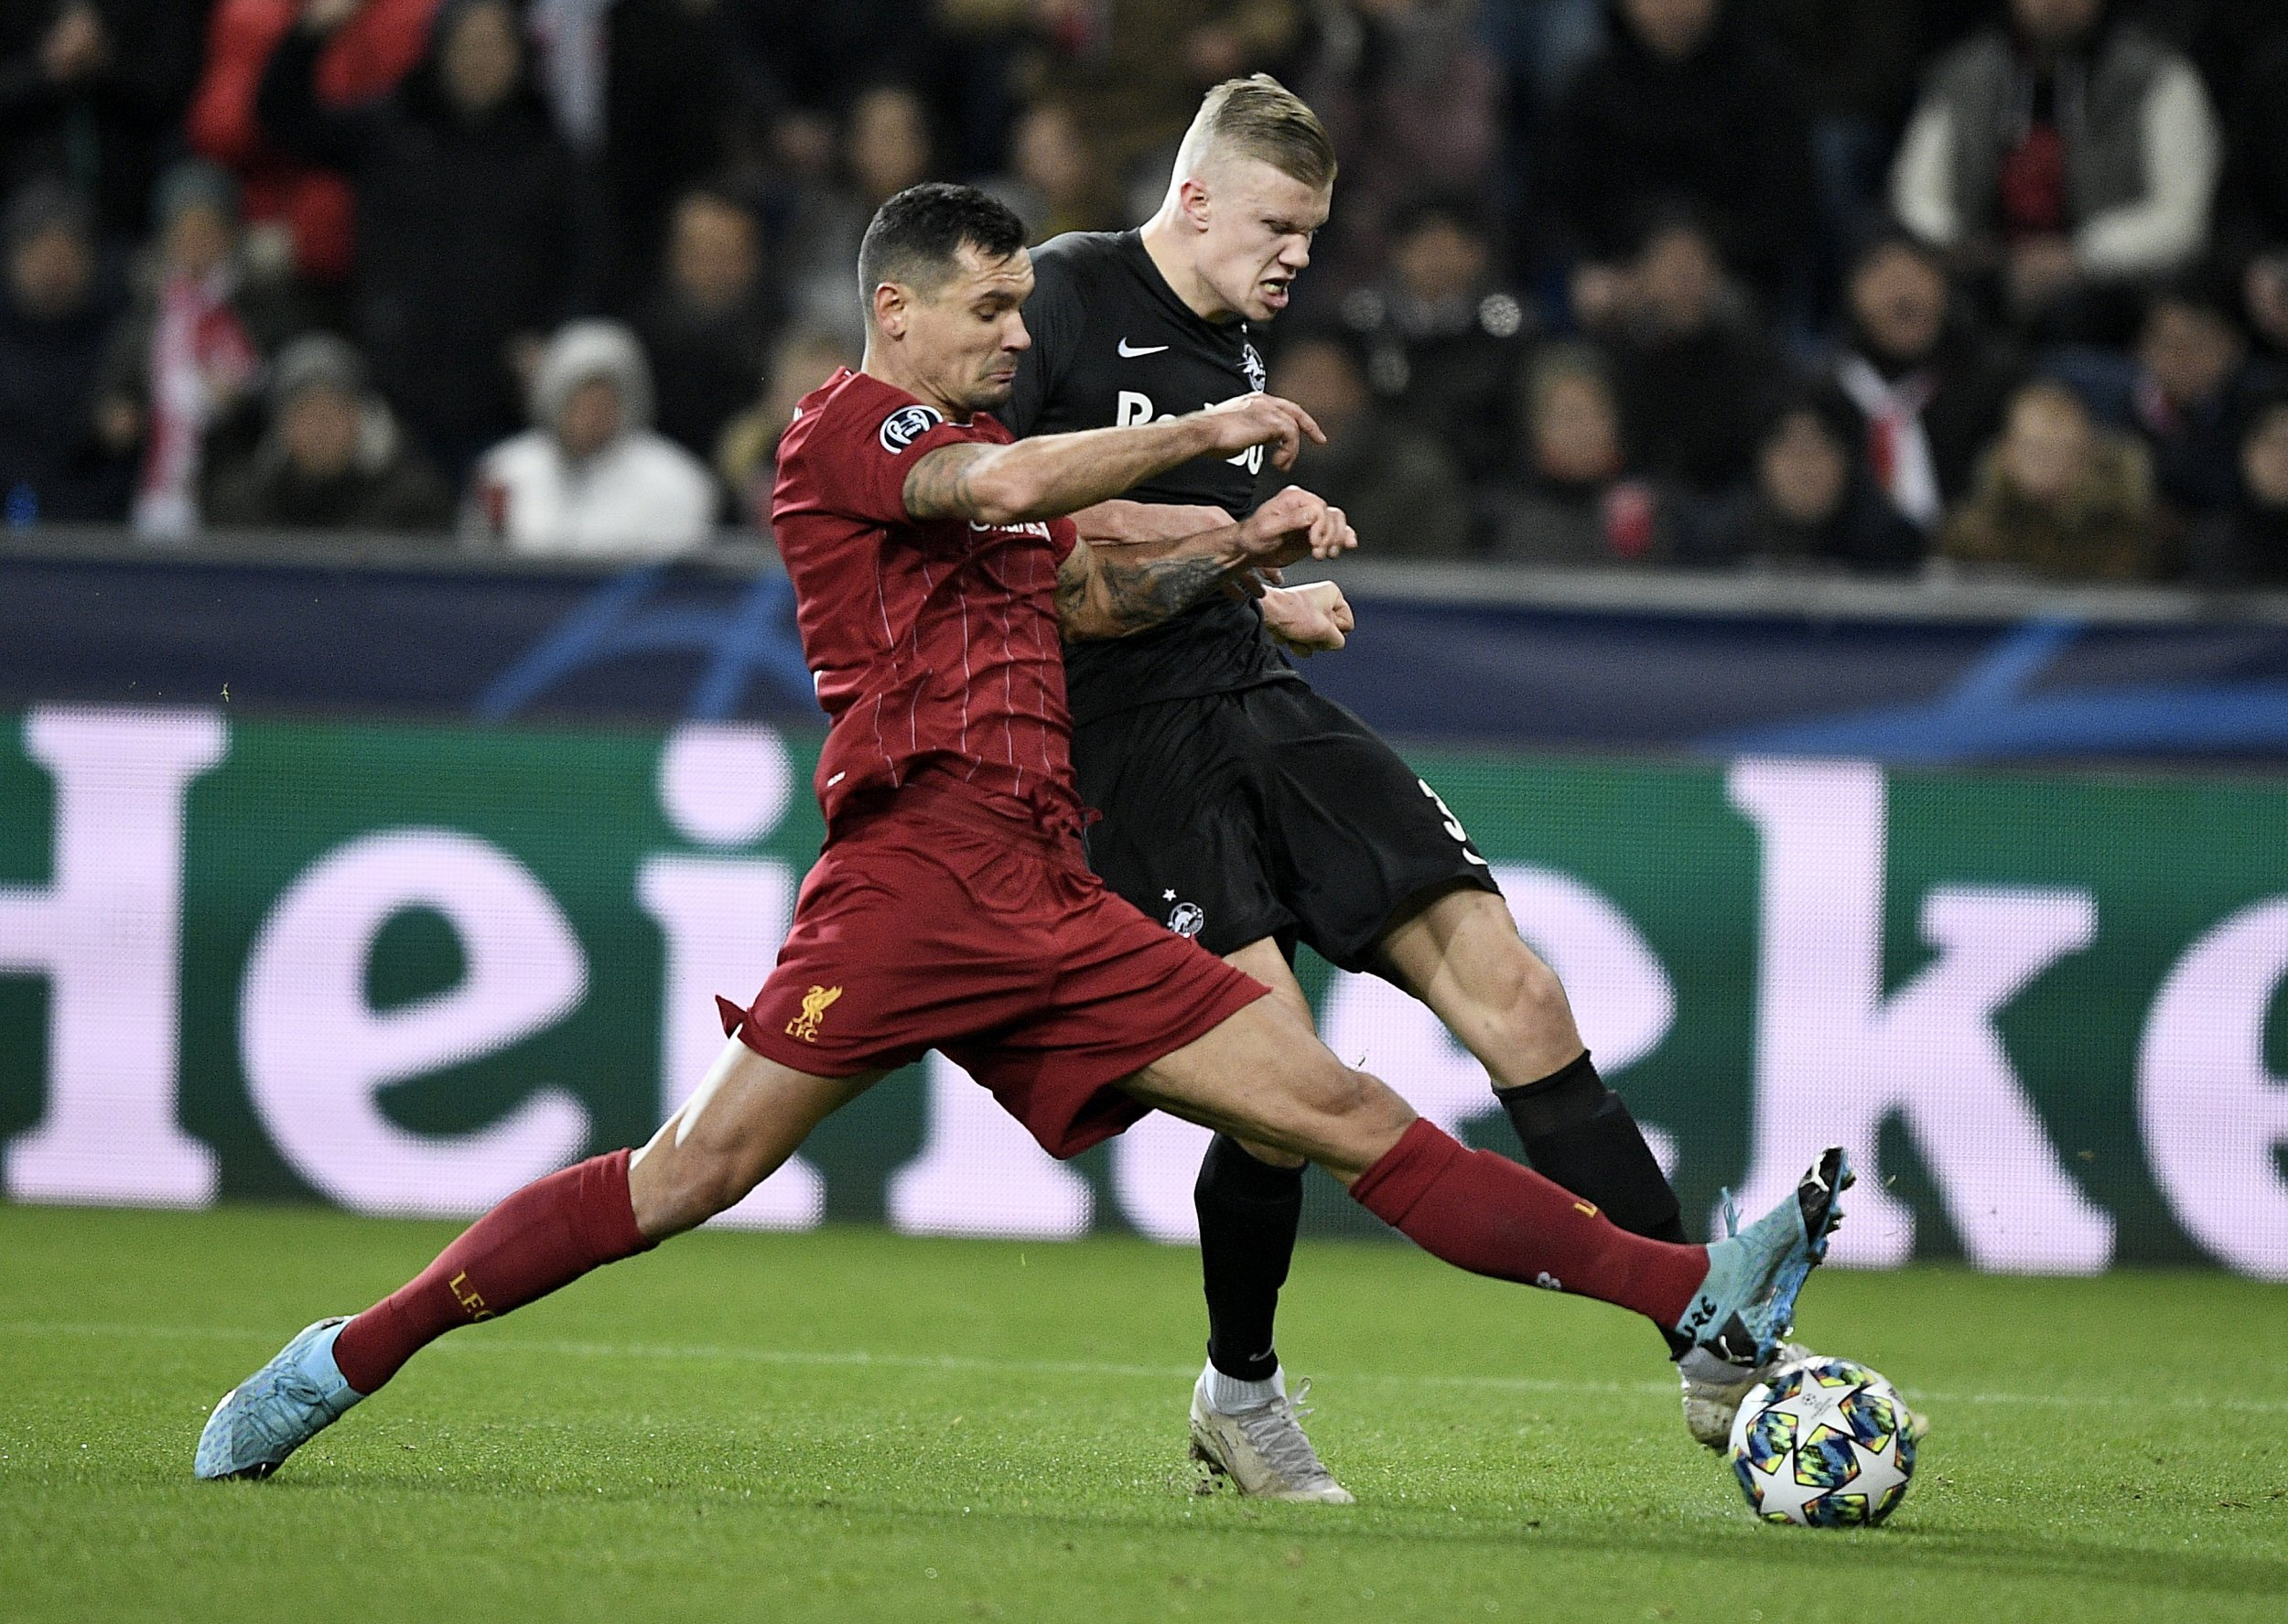 Man Utd boss Ole Gunnar Solskjaer has made transfer promise to top target Erling Haaland - Bóng Đá